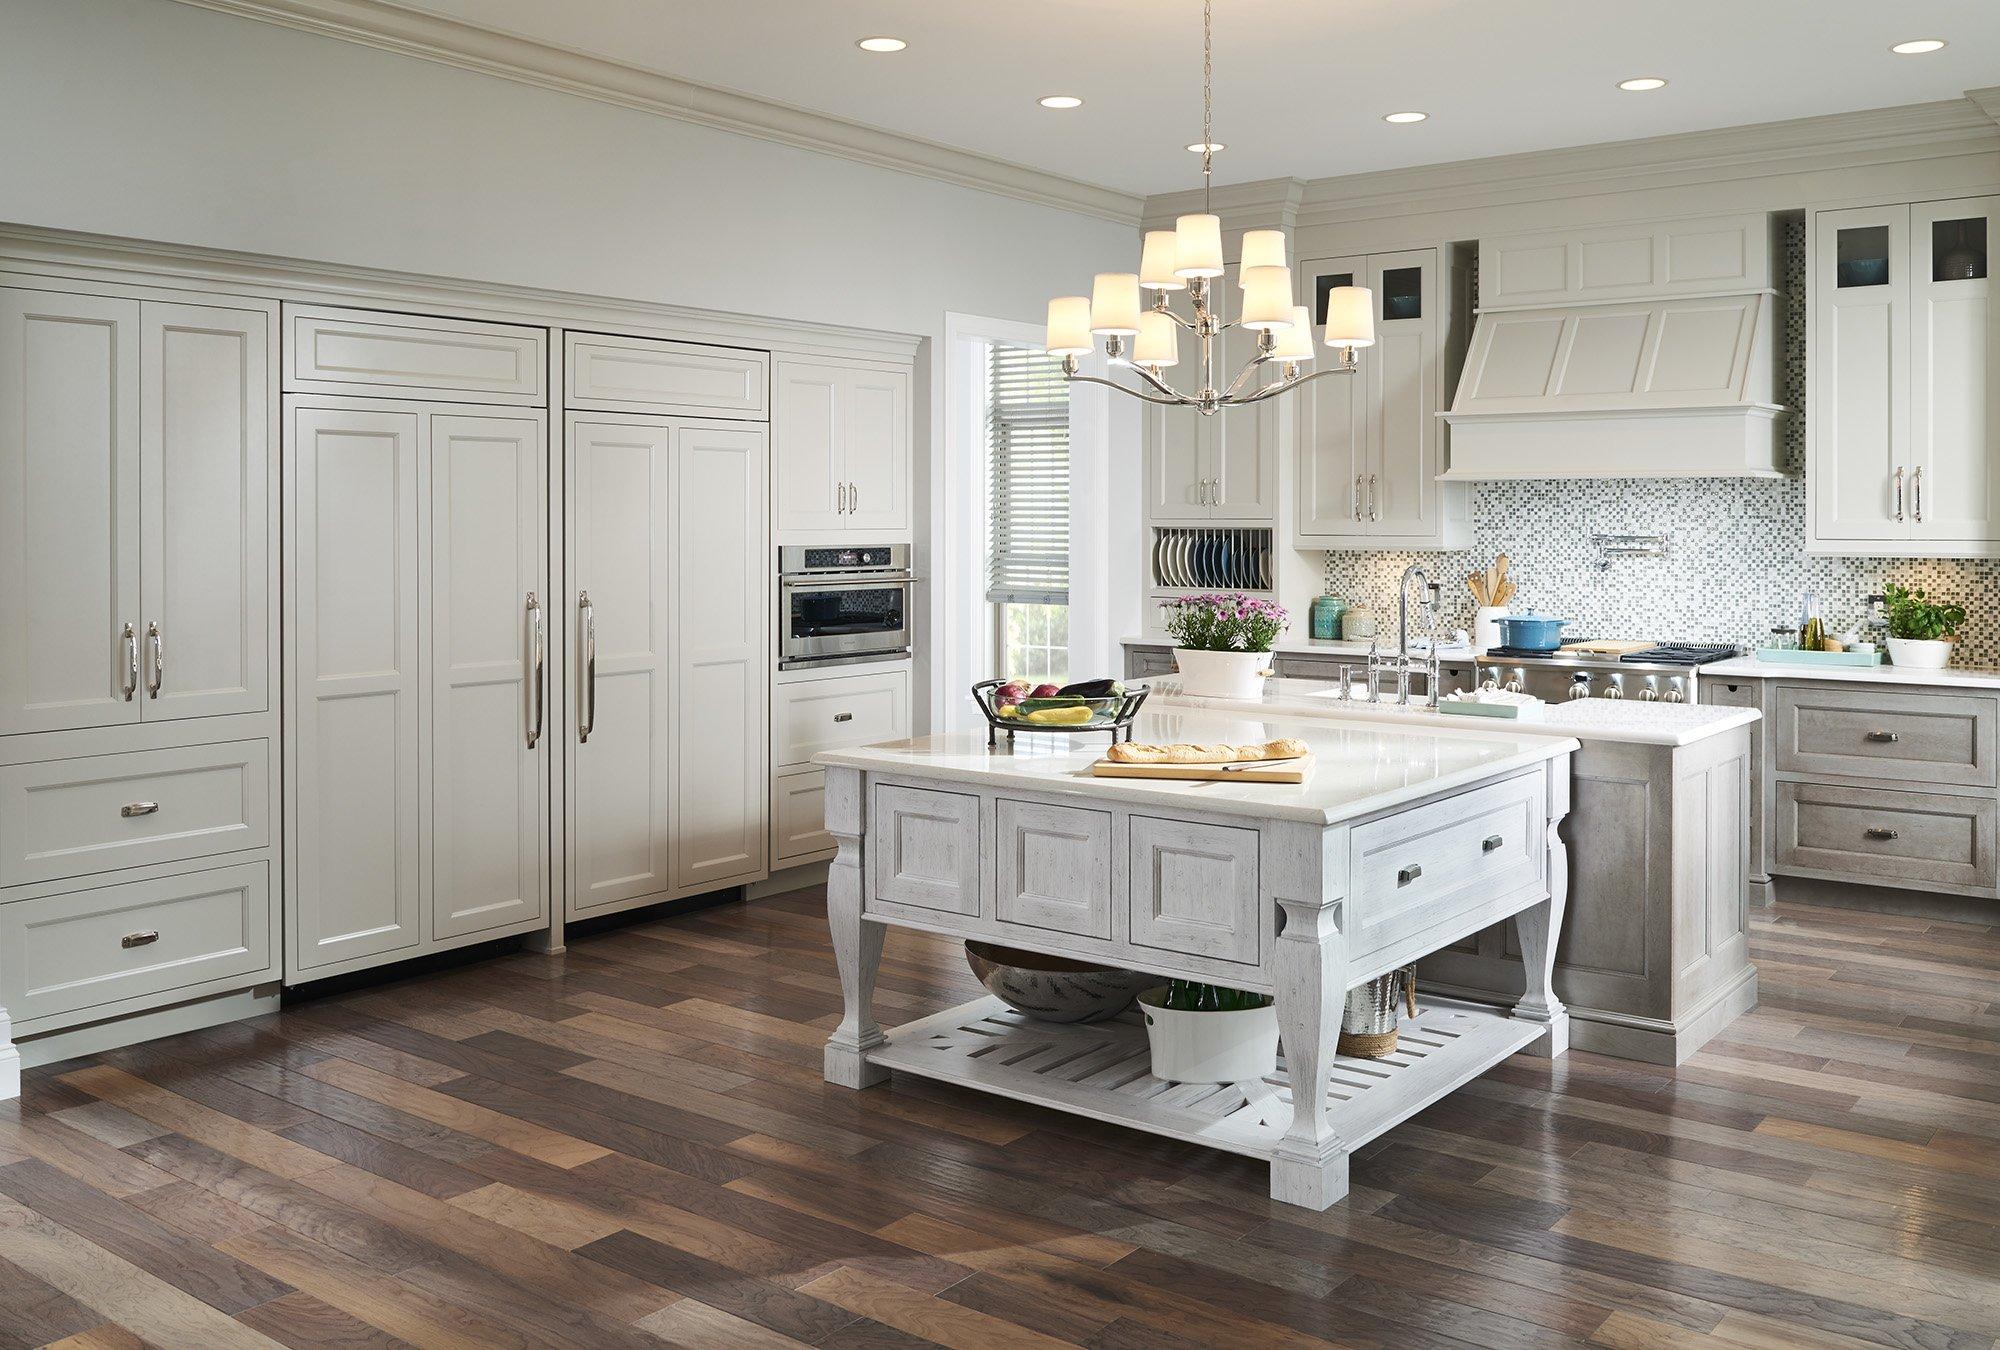 Kitchen Remodel Salisbury MD | Bath Remodel | Kitchen Concepts Plus